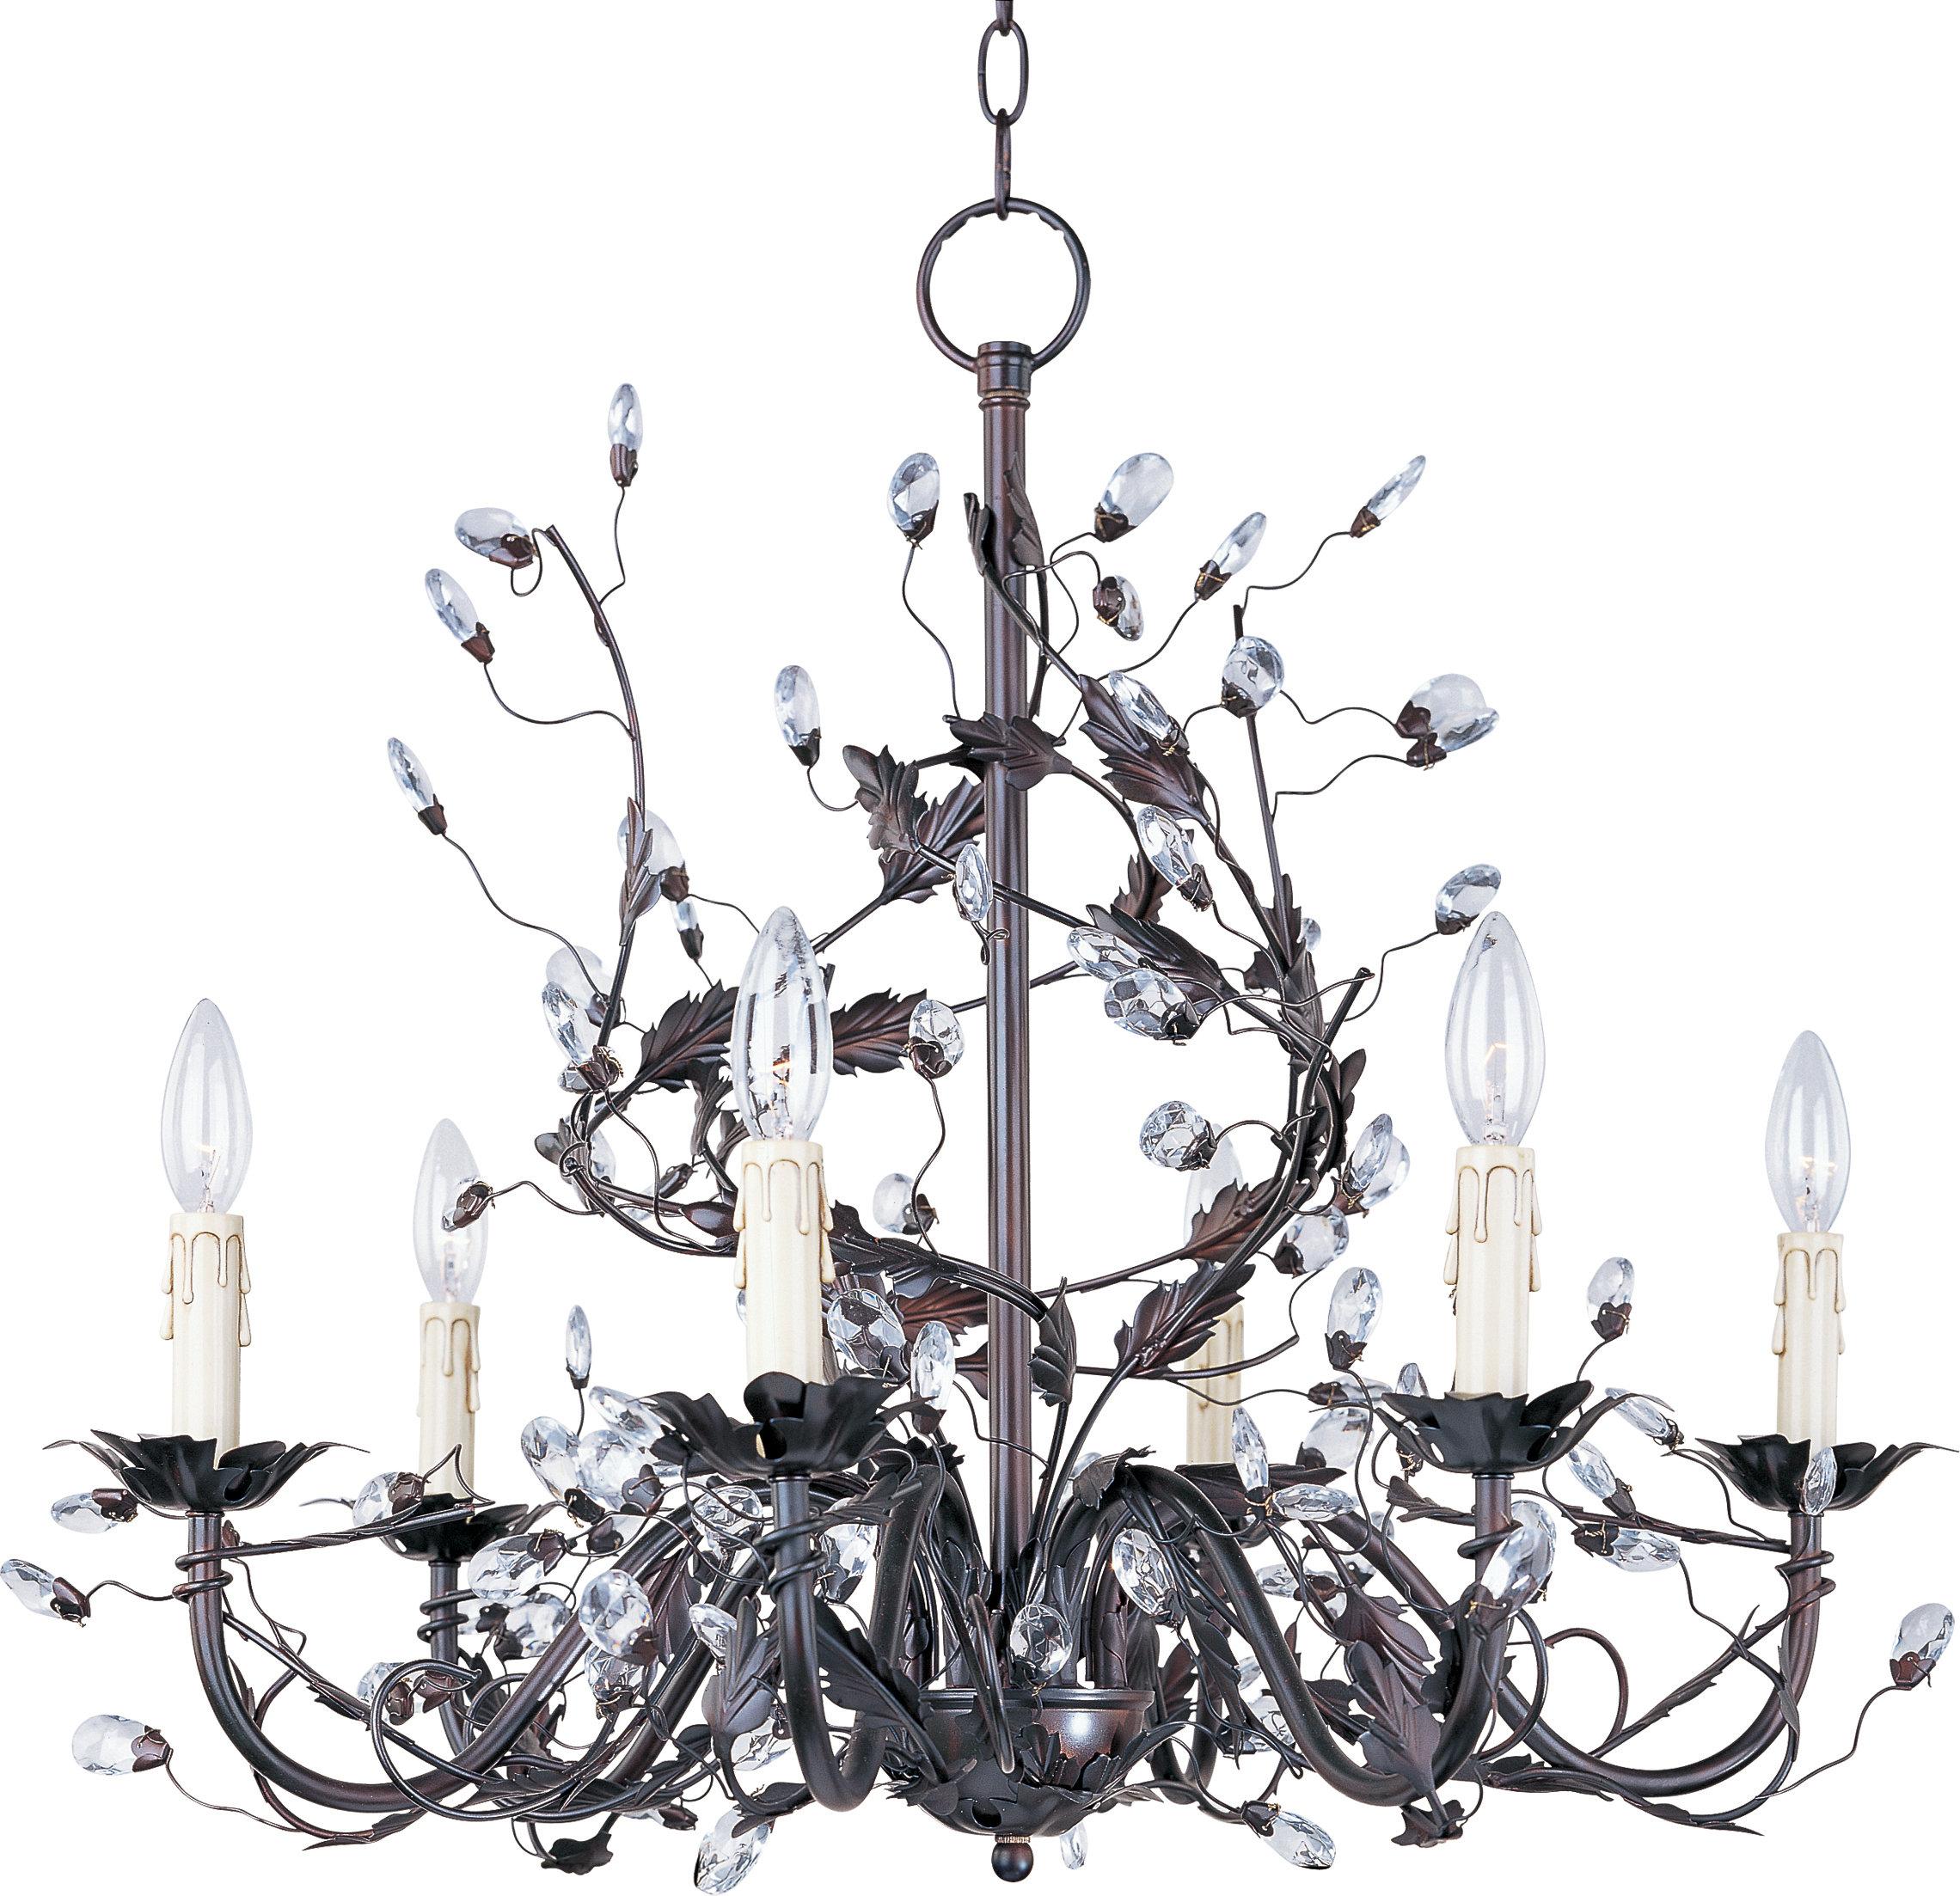 Kaiya 6 Light Candle Style Chandelier Regarding Widely Used Hesse 5 Light Candle Style Chandeliers (Gallery 10 of 25)